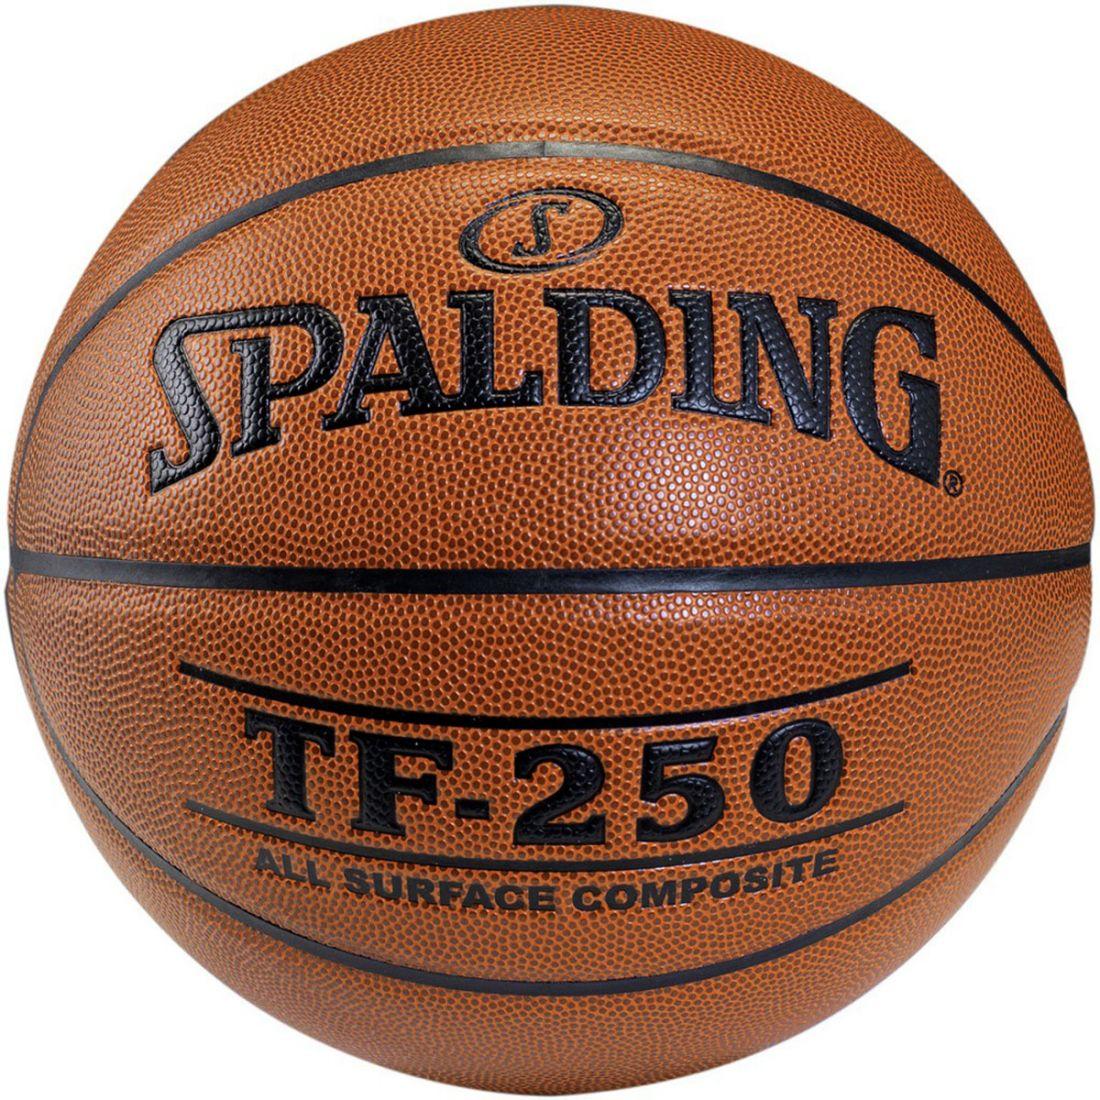 Мяч баскетбольный Spalding TF-250 (74-531)